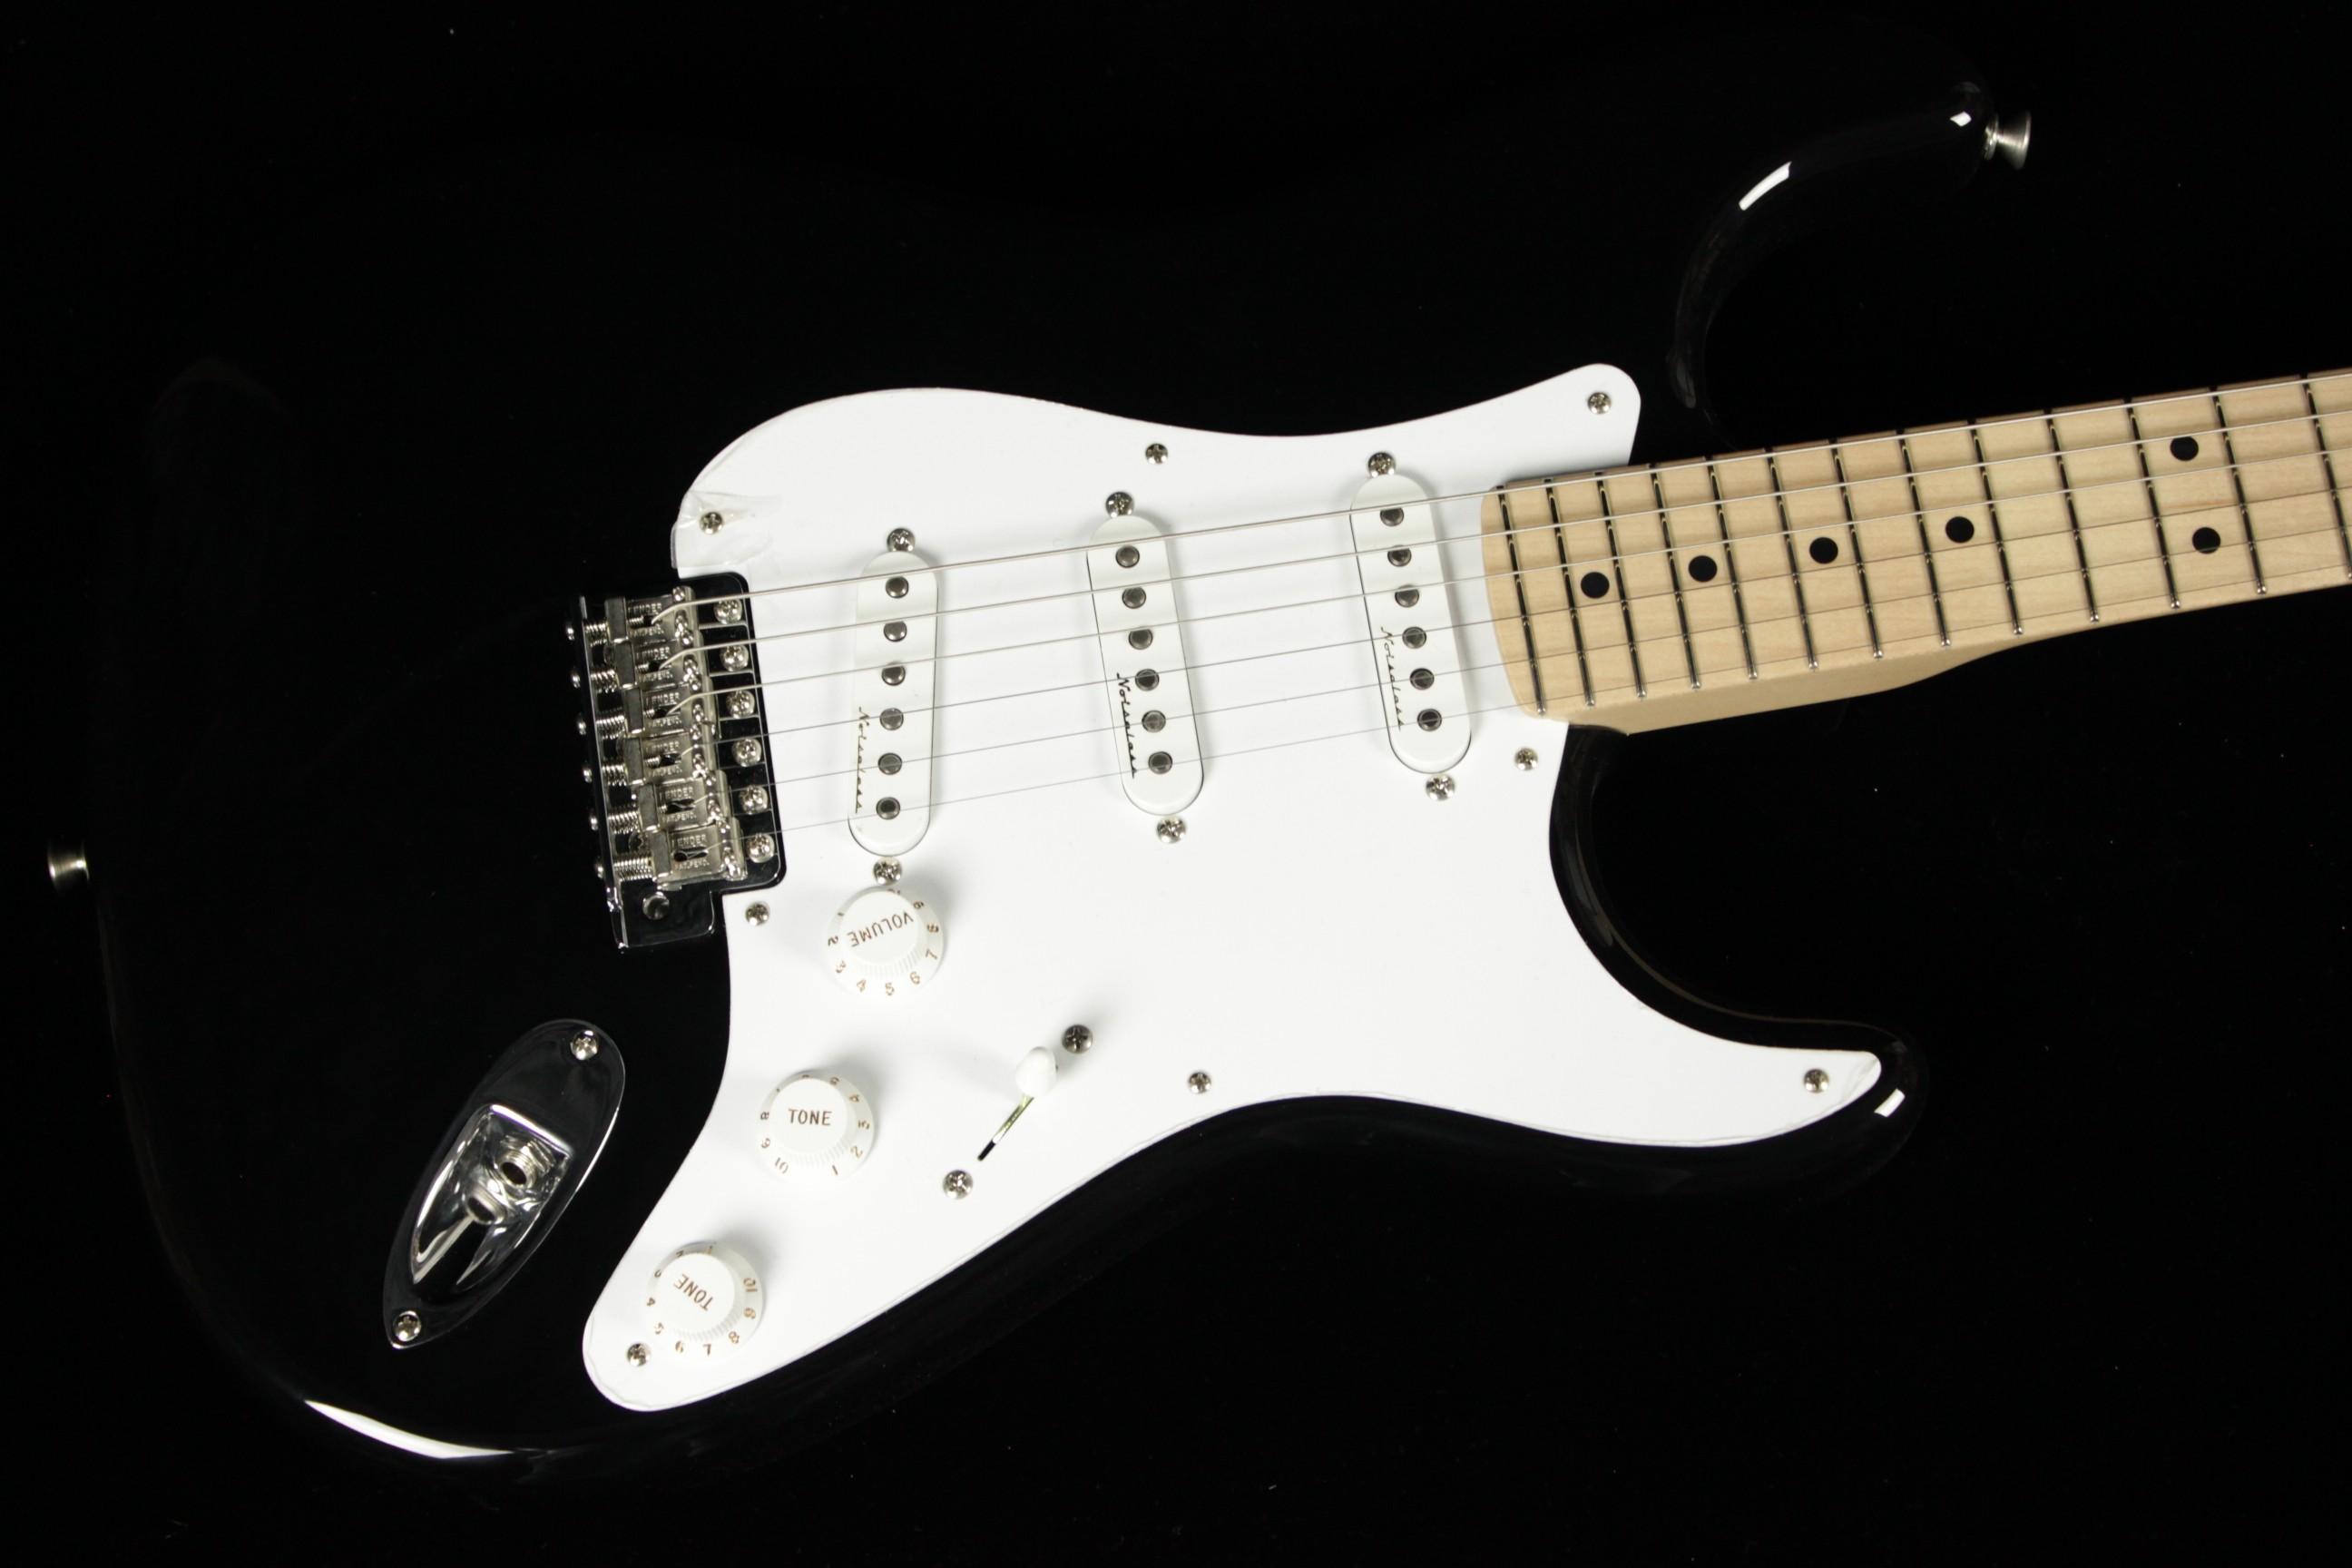 fender custom eric clapton signature stratocaster black sn cz533047 gino guitars. Black Bedroom Furniture Sets. Home Design Ideas